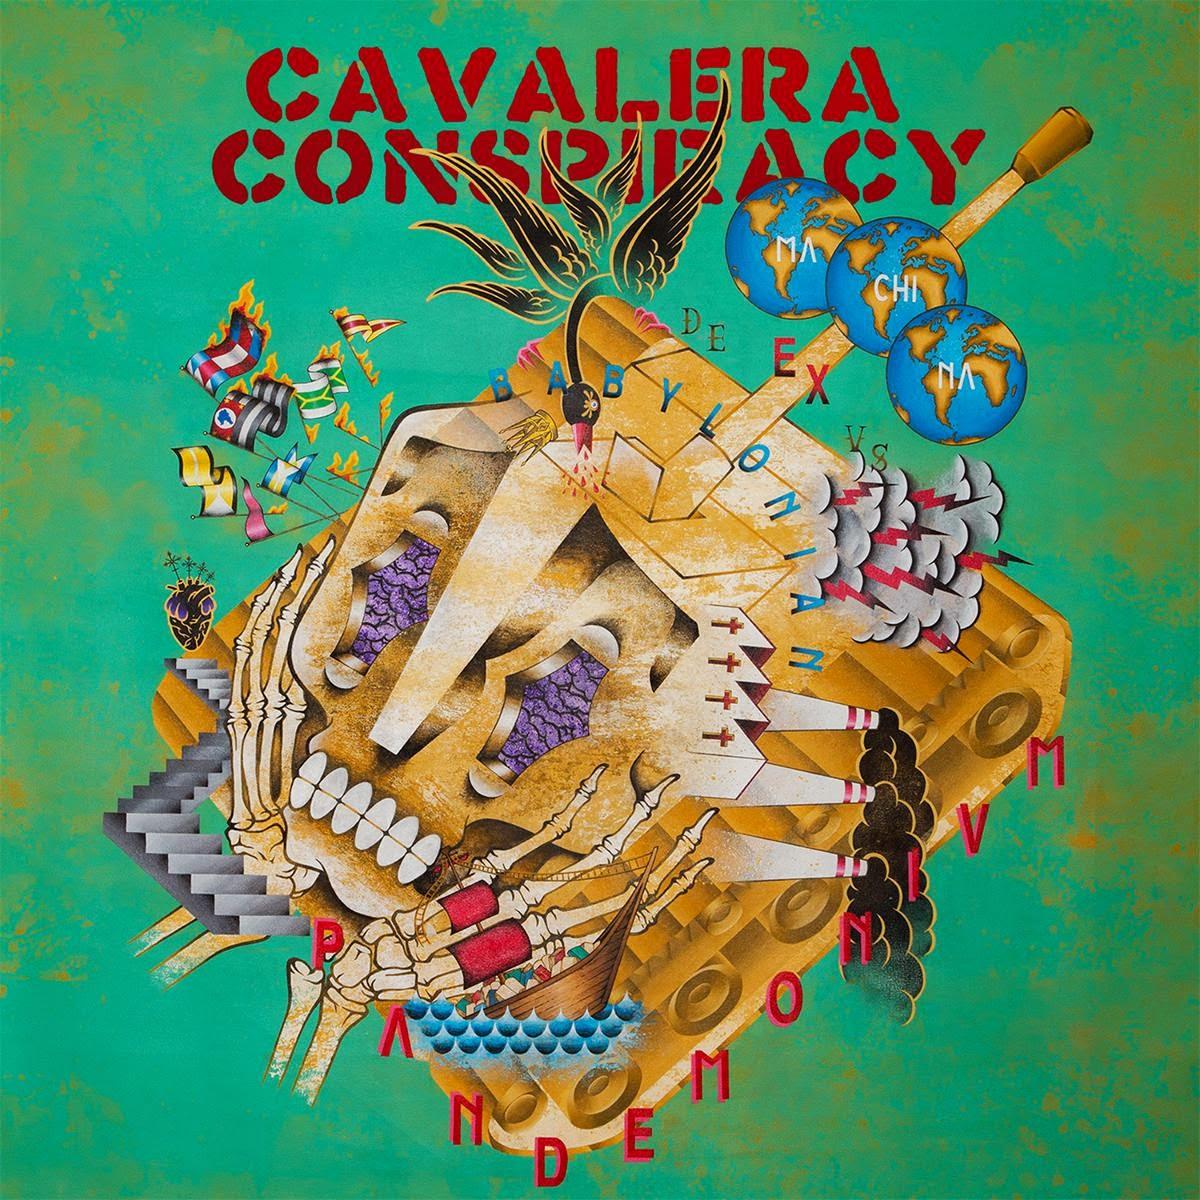 Cavalera Conspiracy - Pandemonium (2014)  [Deluxe Edition]